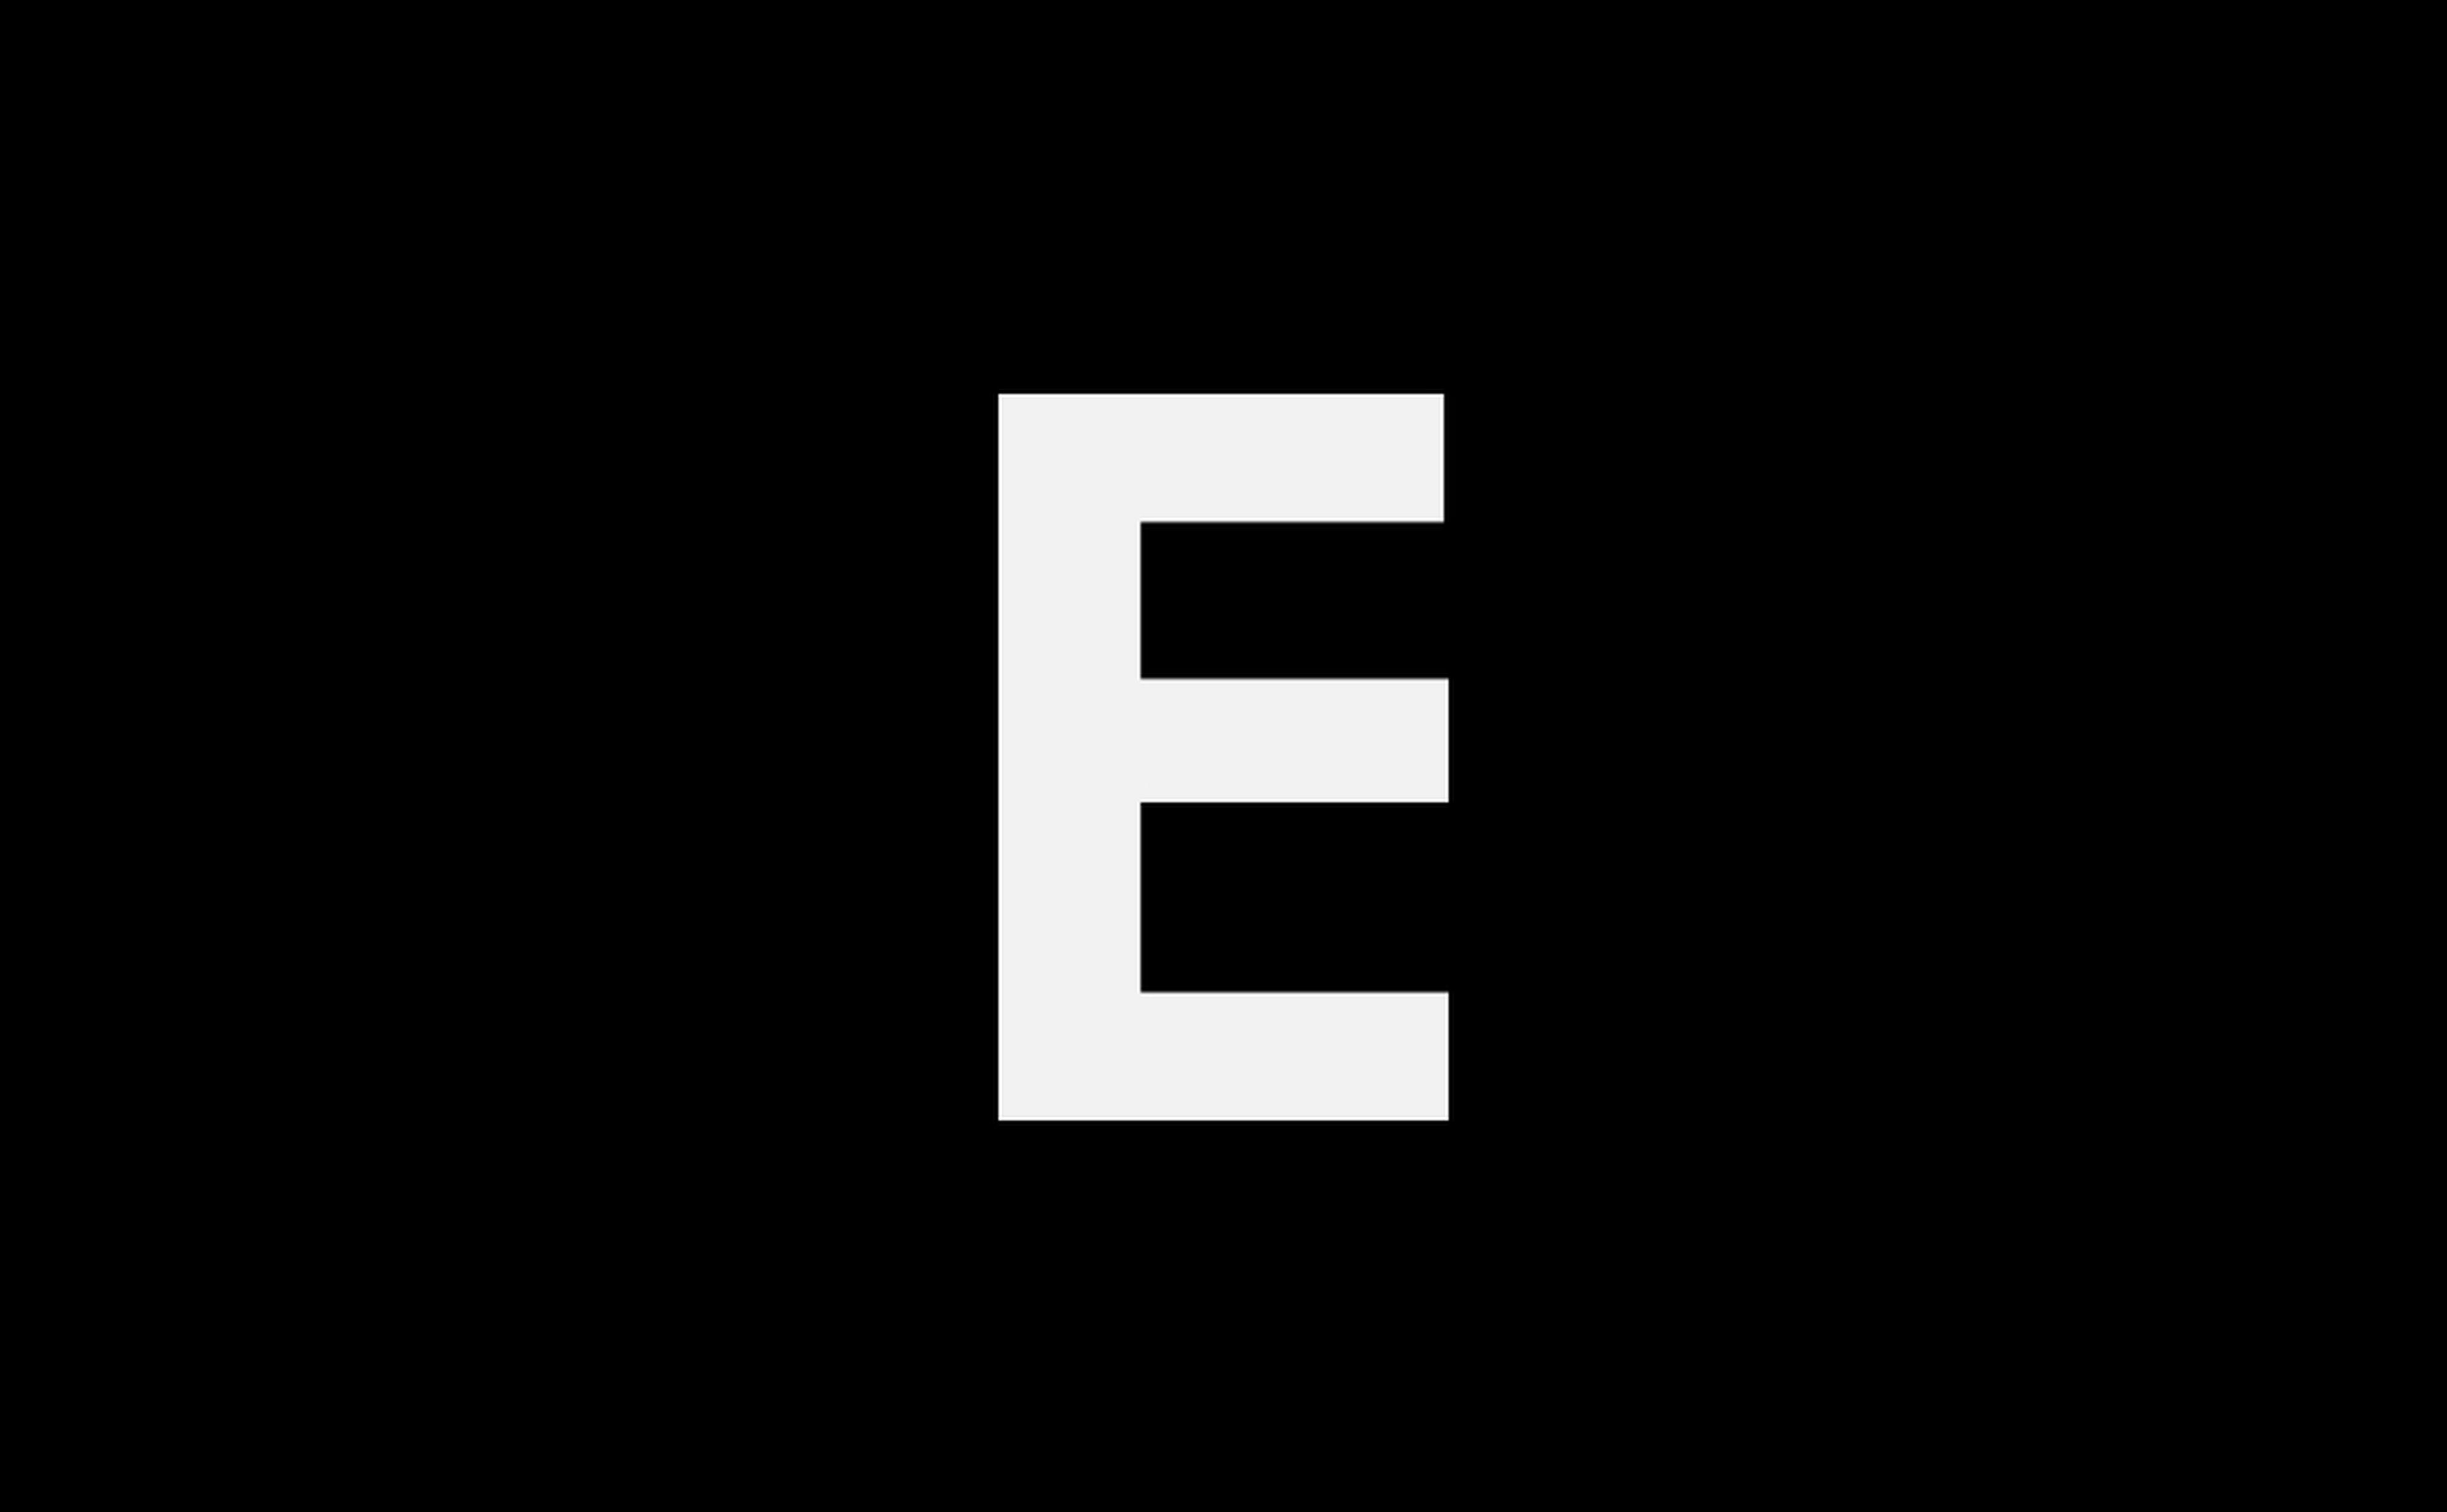 ➡ chikikanayaphotography.jimdo.com ➡ C&L Photography-Art (facebok) Canon1100d Canon Canonphotography Photoshooting Photography Photographer Tokyo Tokyocameraclub Earth_portraits Portraitmood Portrait Portraiture PortraitPhotography Girl Pretty Flowerphotography Park Art Artist BlueEyes 東京 写真 ポートレート ポートレートモデル